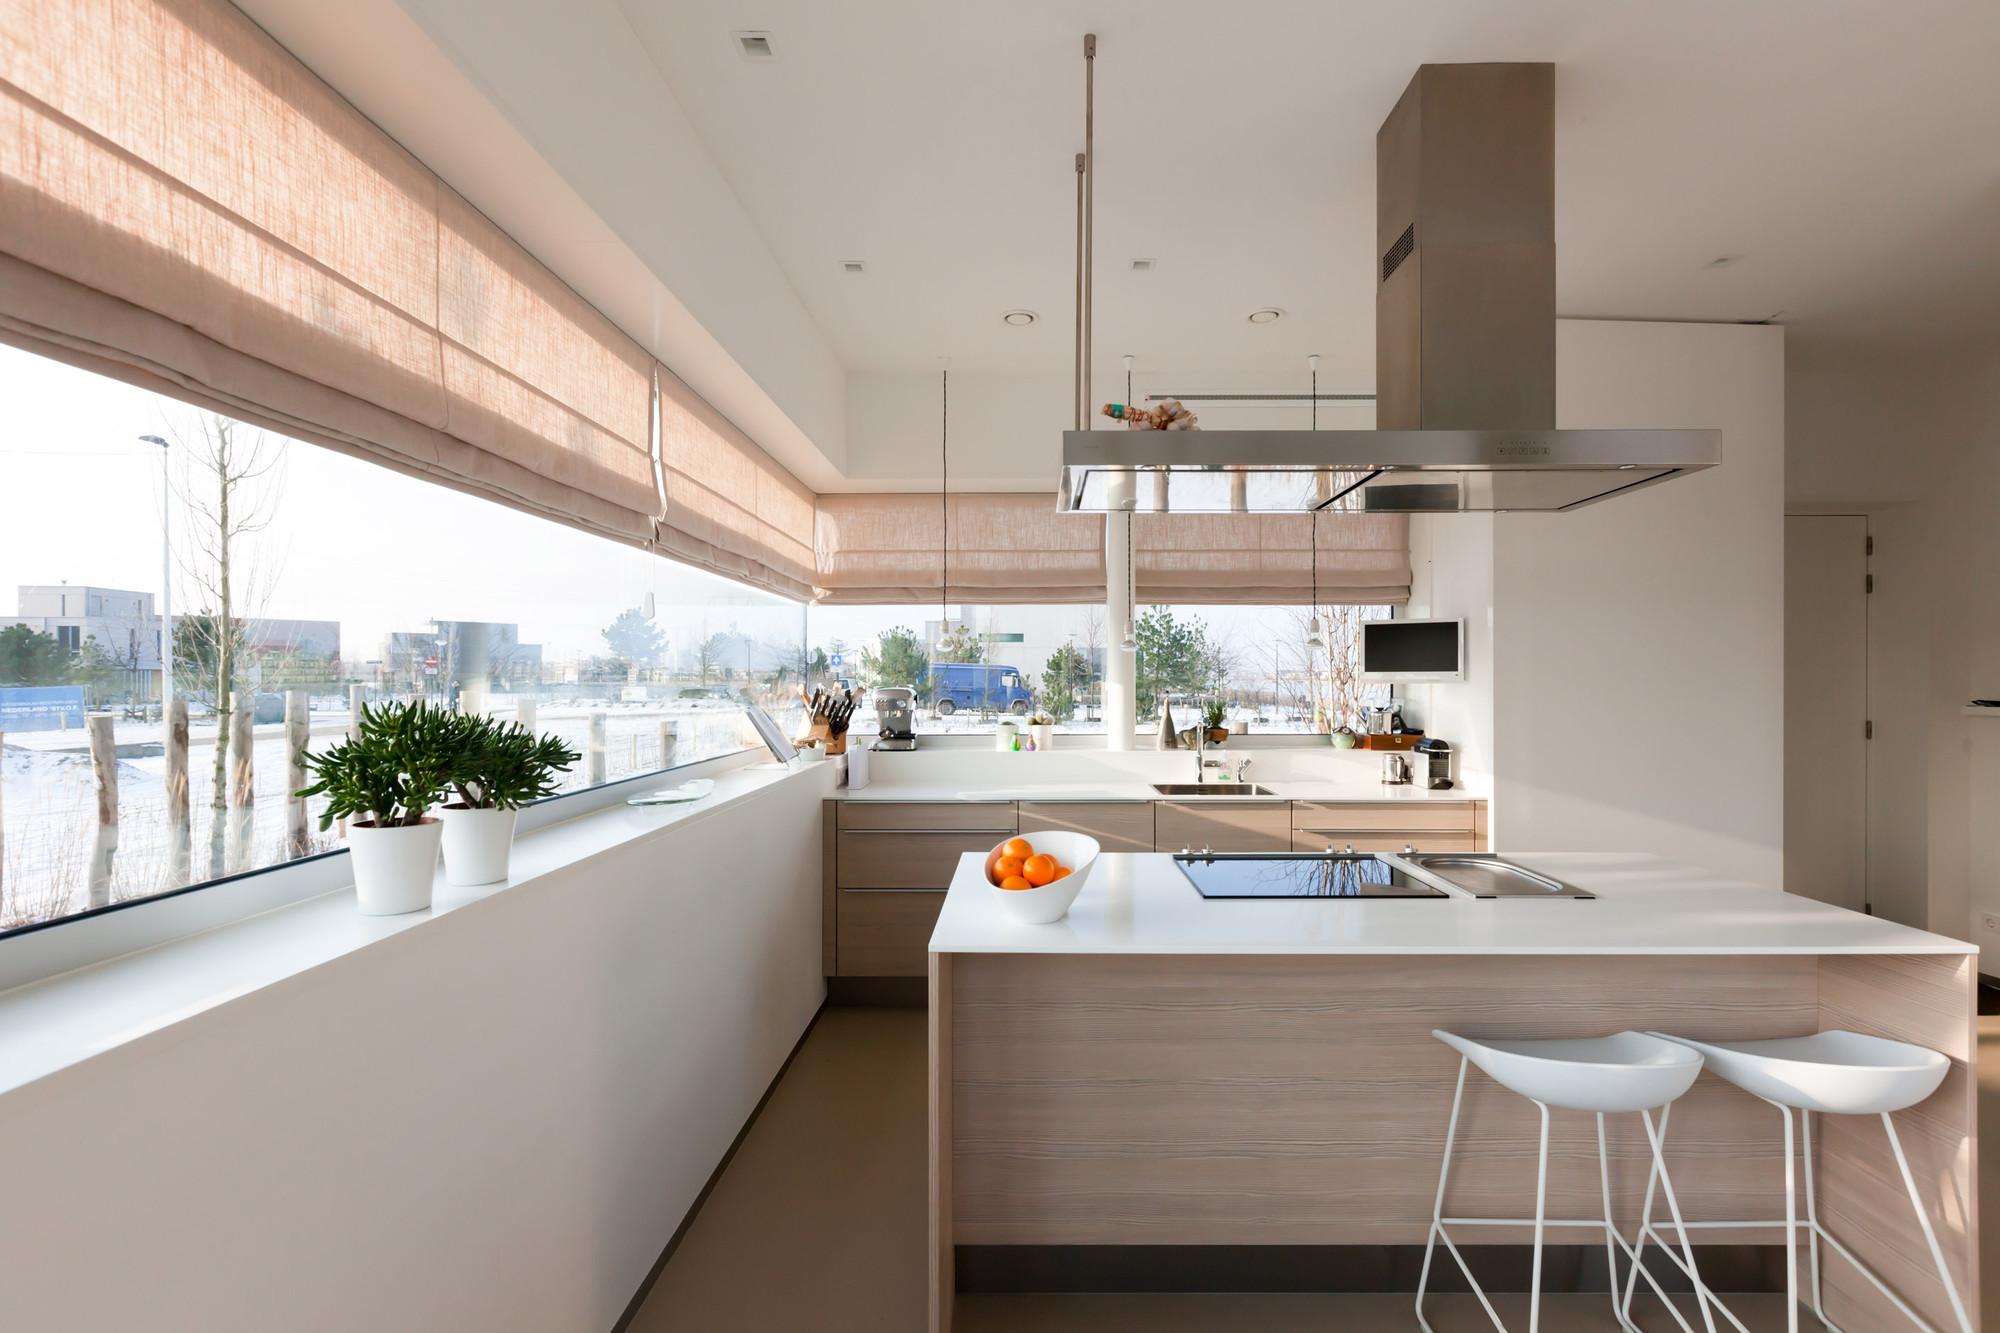 Ijburg villa marc prosman architecten archdaily